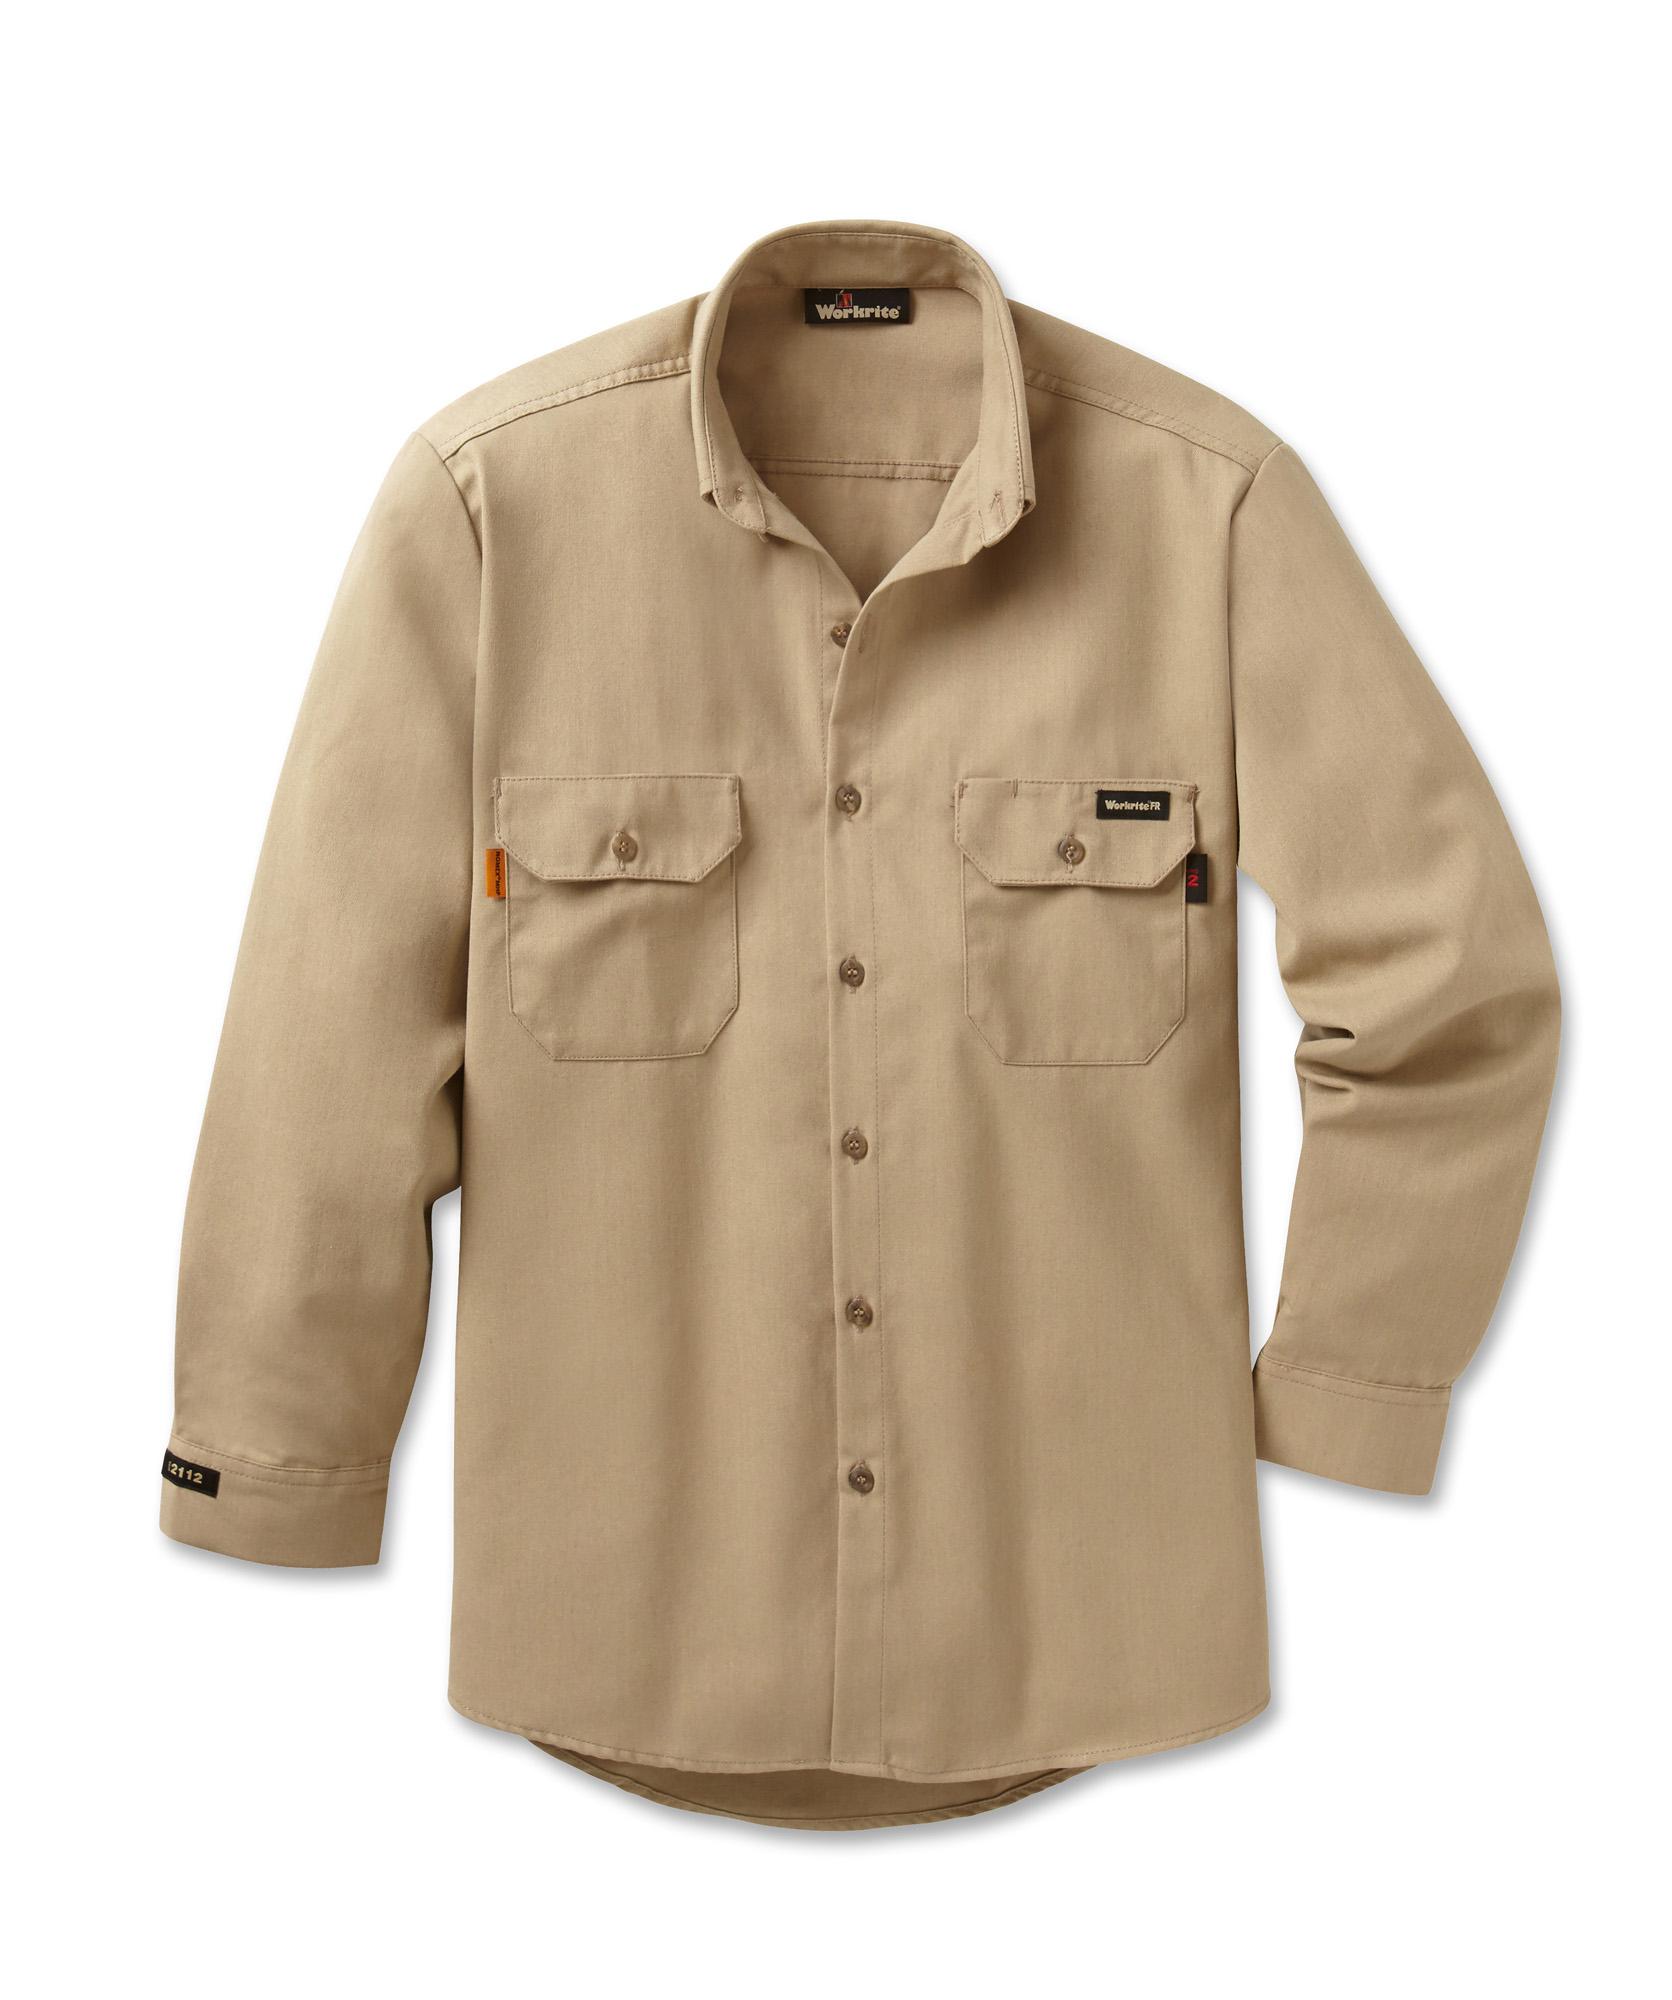 7c11fa42f803 Workrite FR Men s Work Shirt